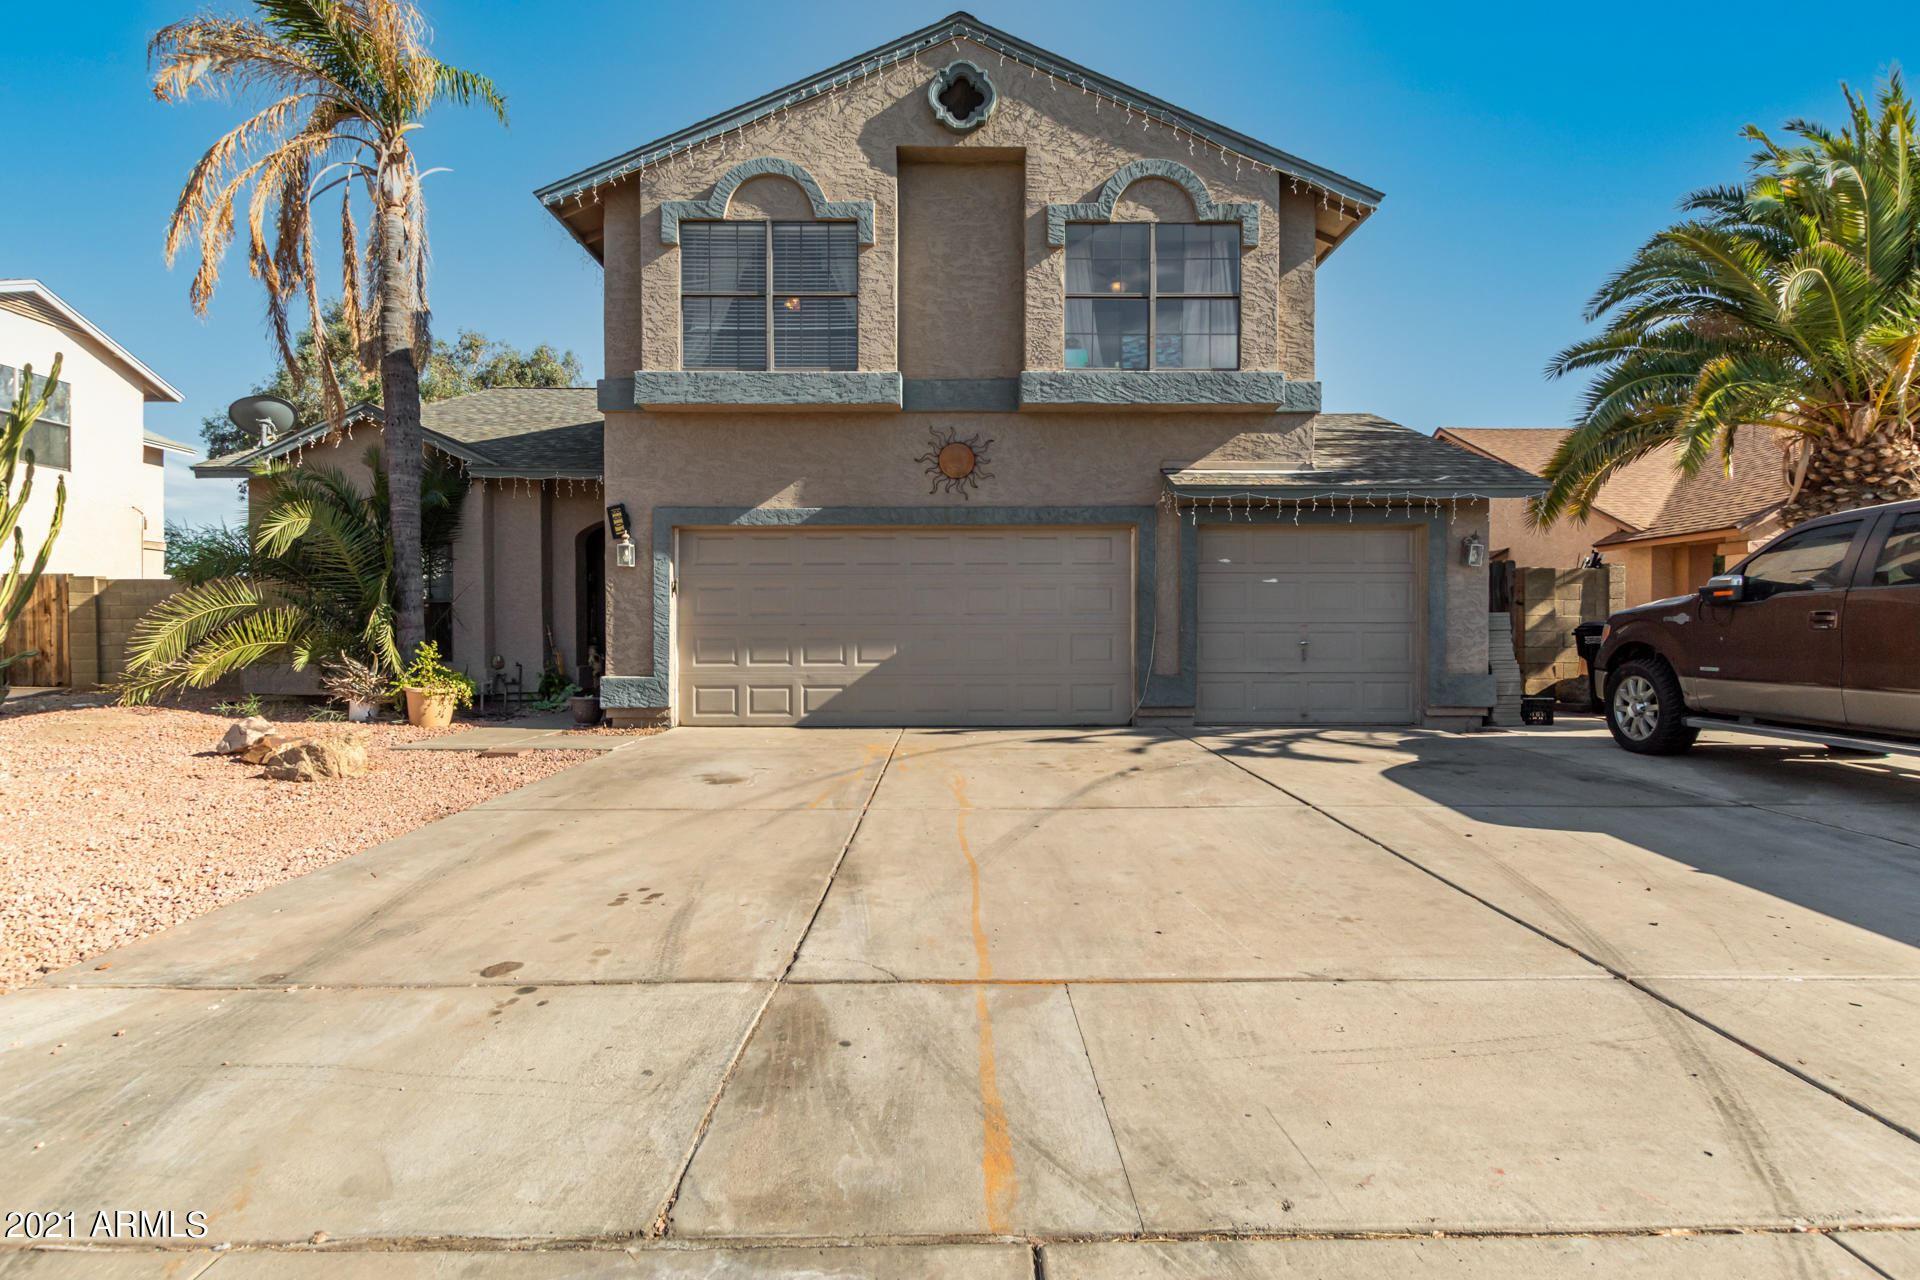 8801 W EDGEMONT Avenue, Phoenix, AZ 85037 - MLS#: 6248242